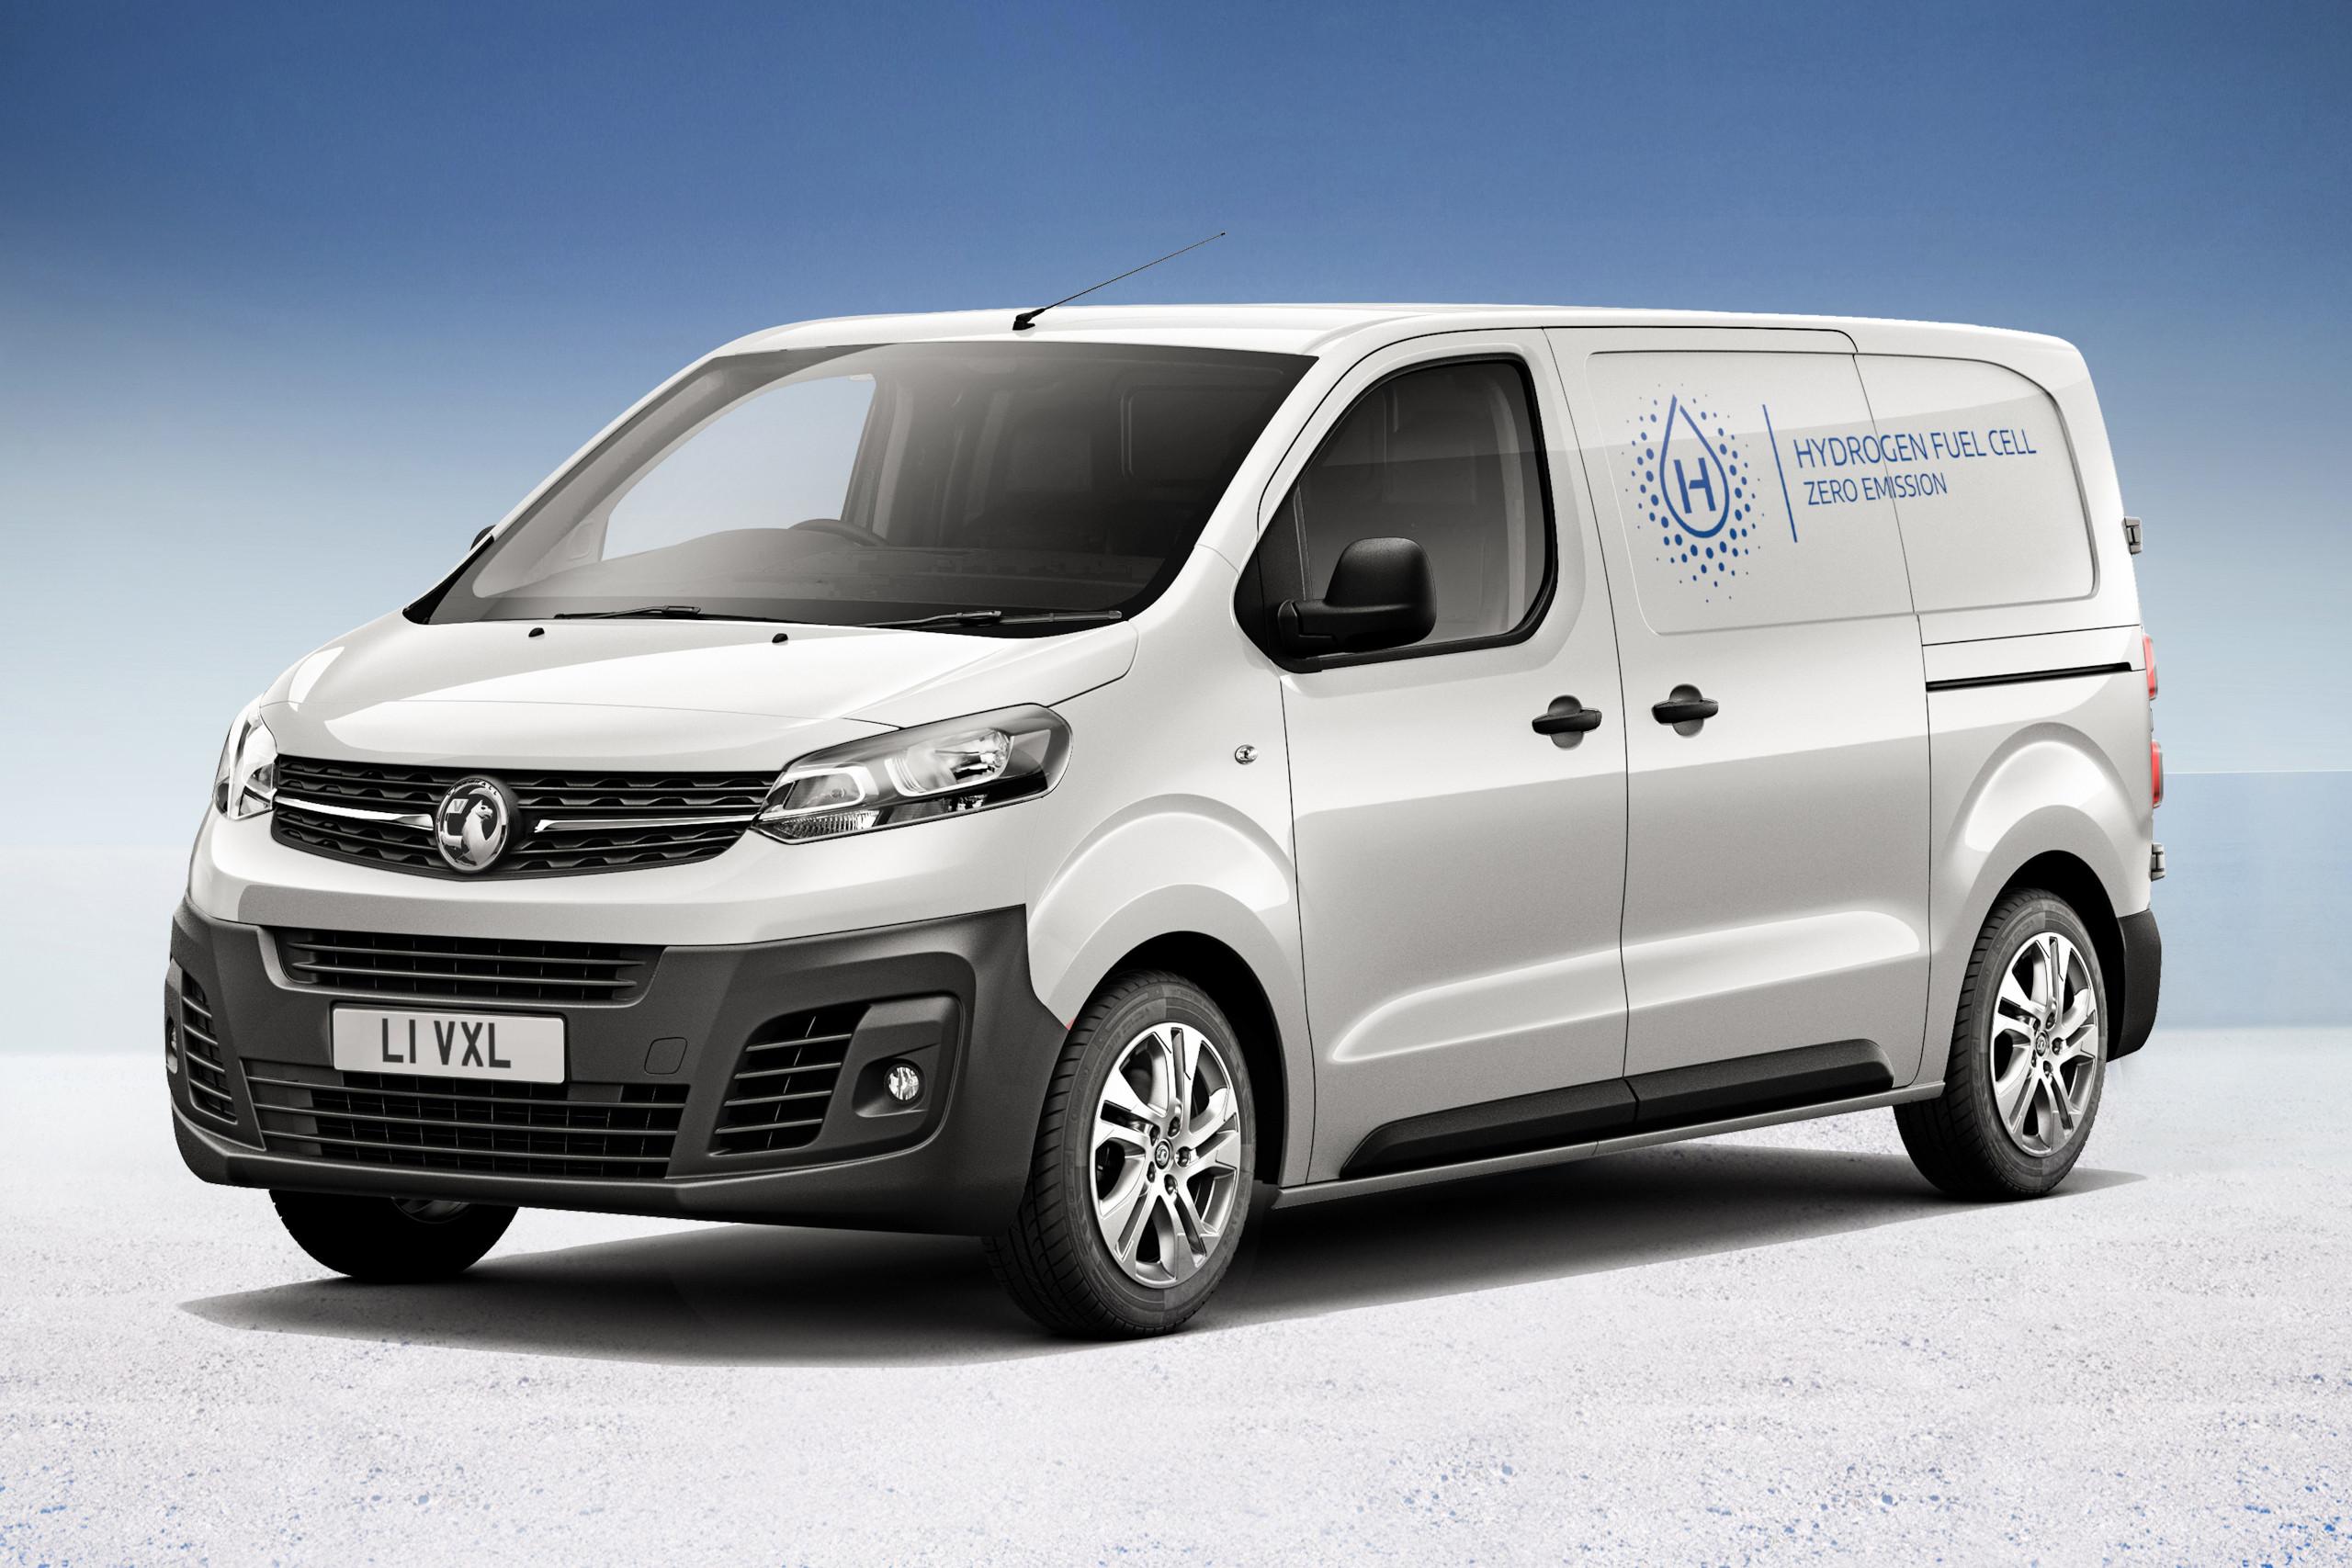 Vauxhall Reveals the Vivaro-e Hydrogen